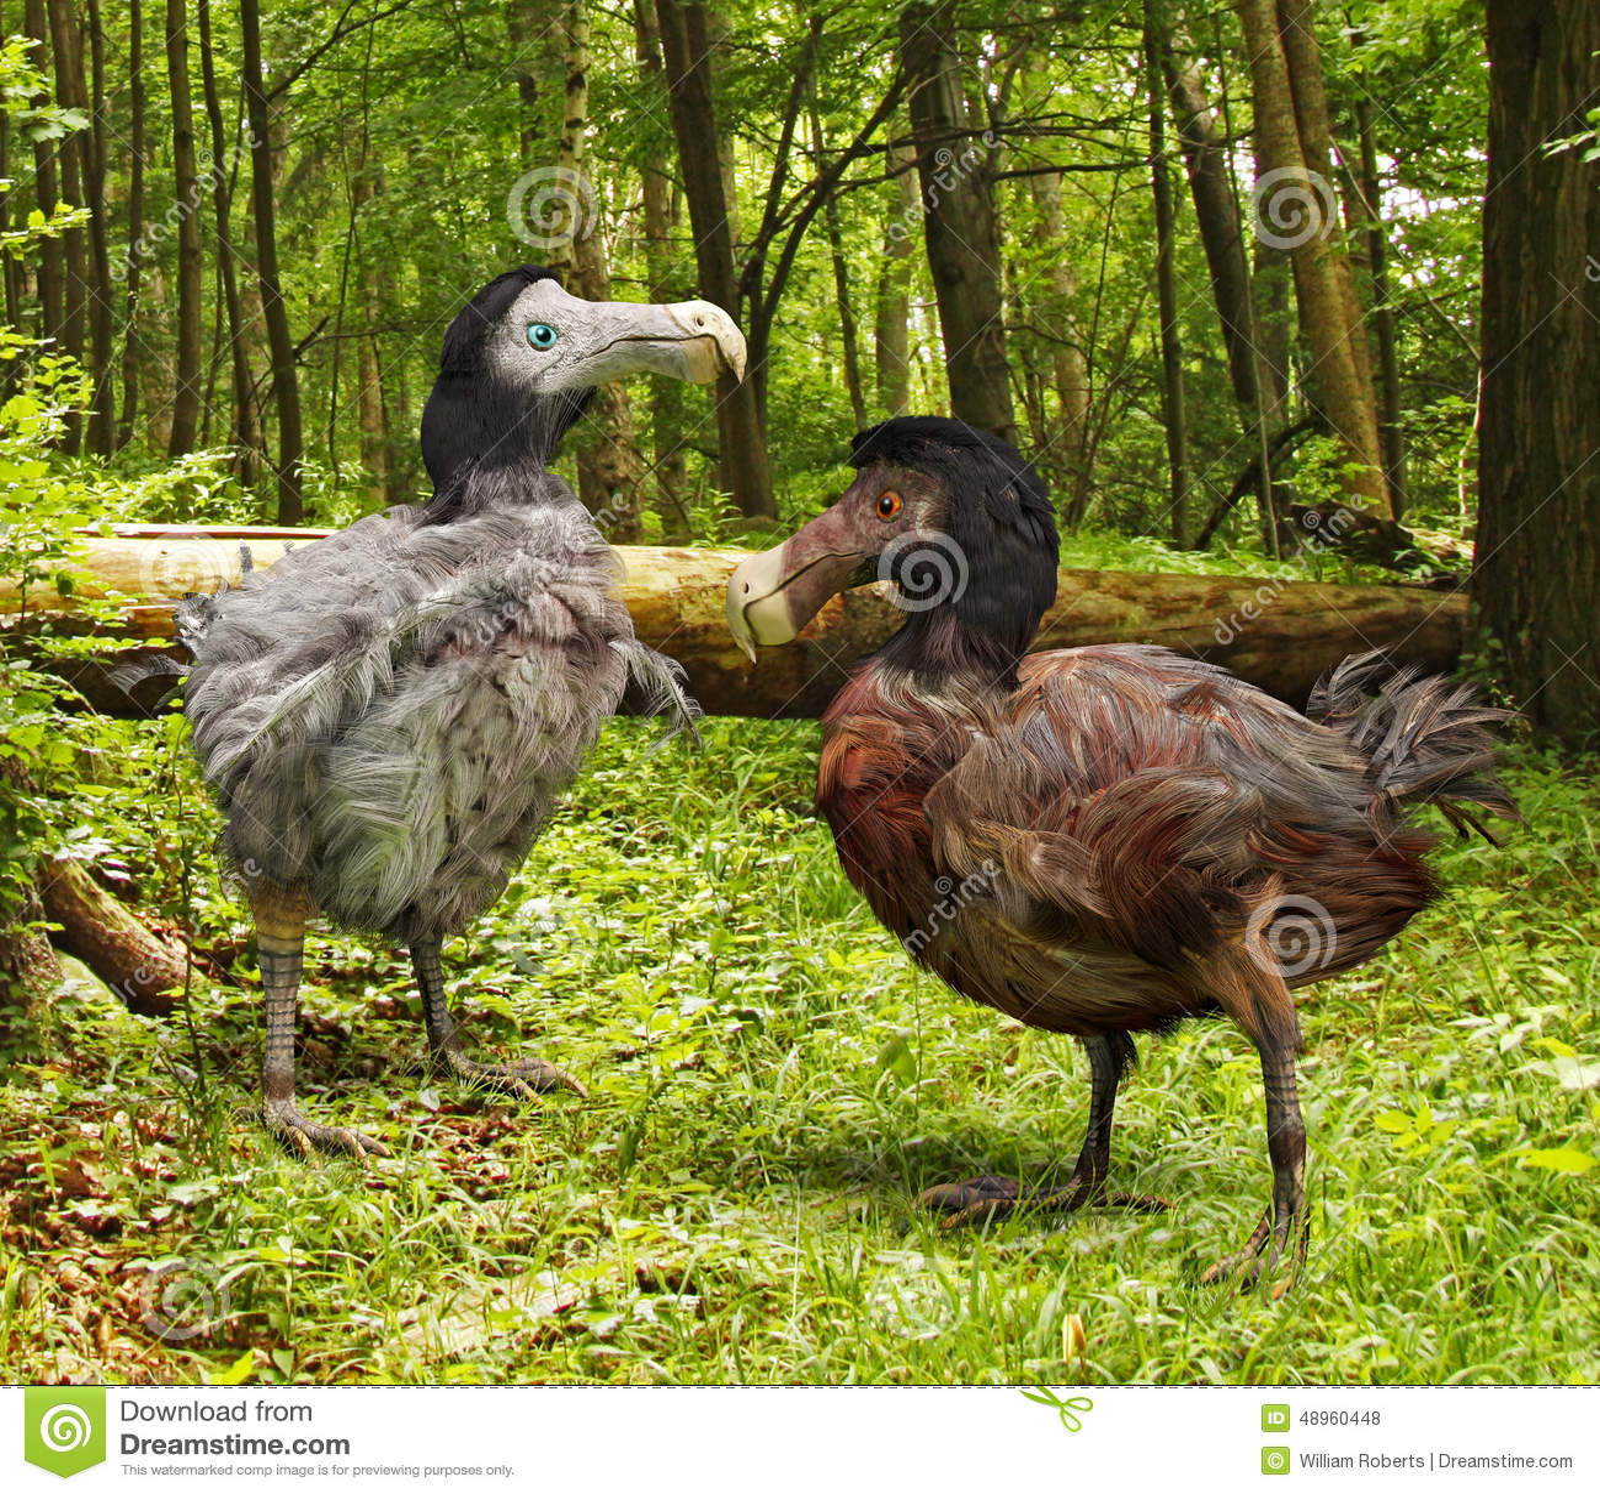 Dodo bird extinction date in Sydney